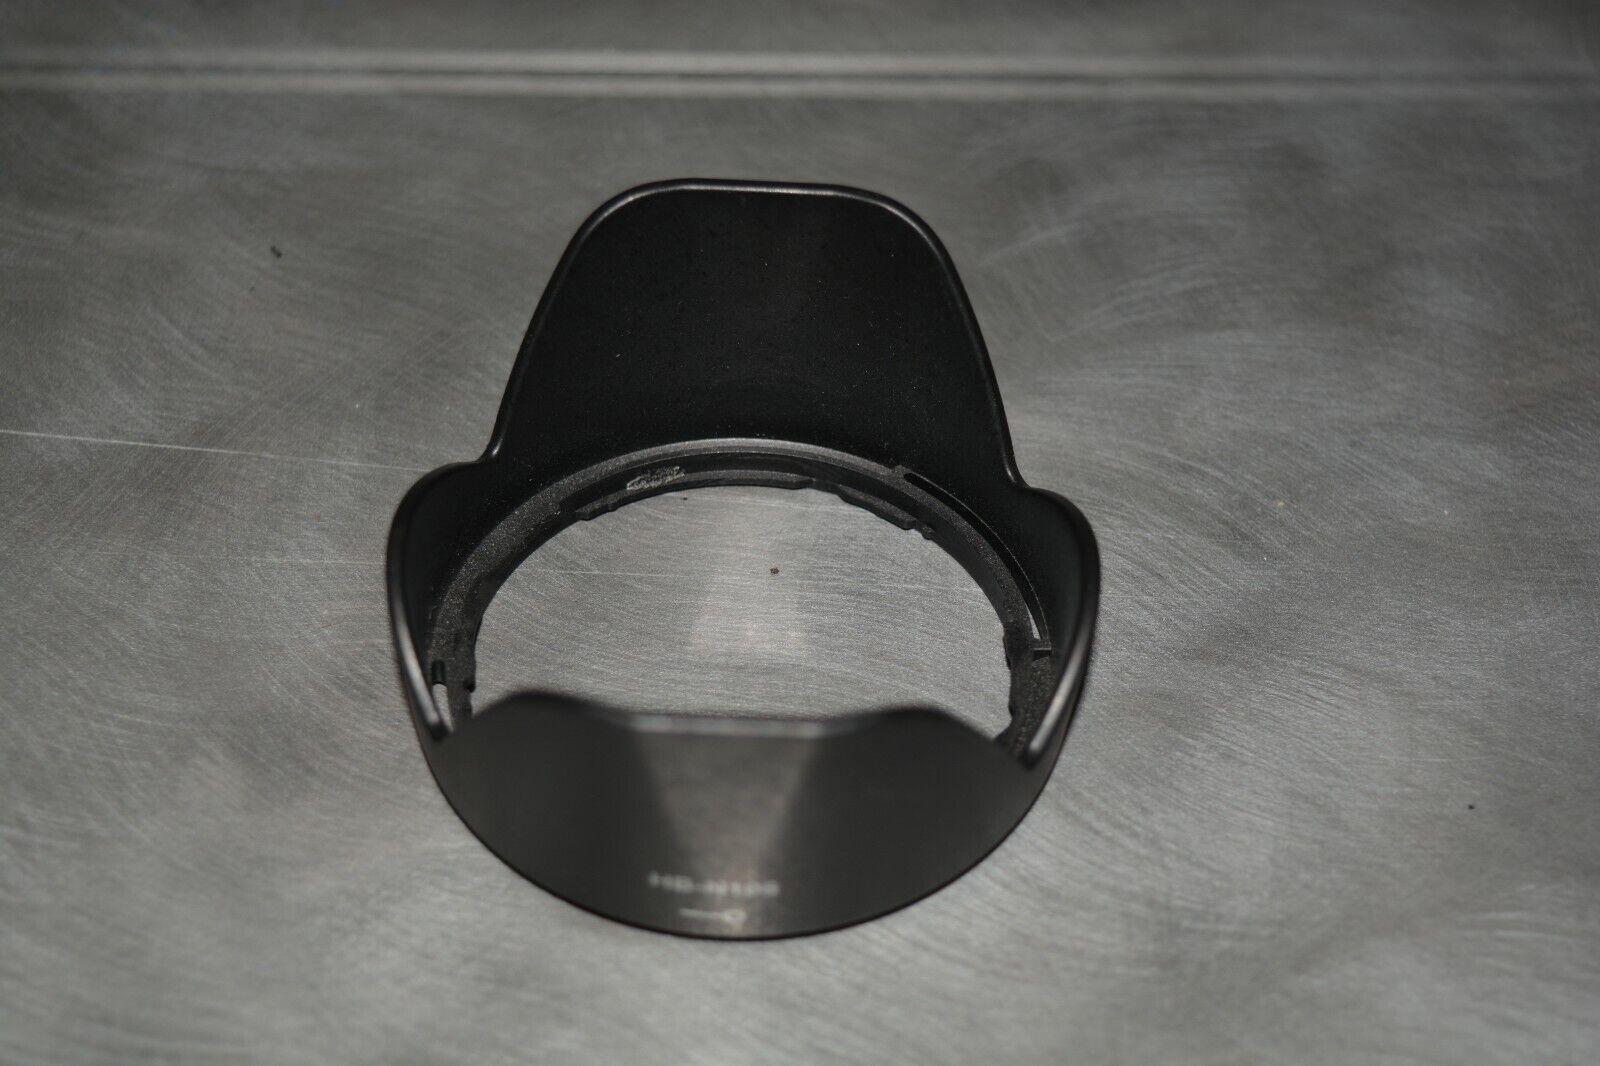 Lens hood Petal, HB N106, bayonet fitting